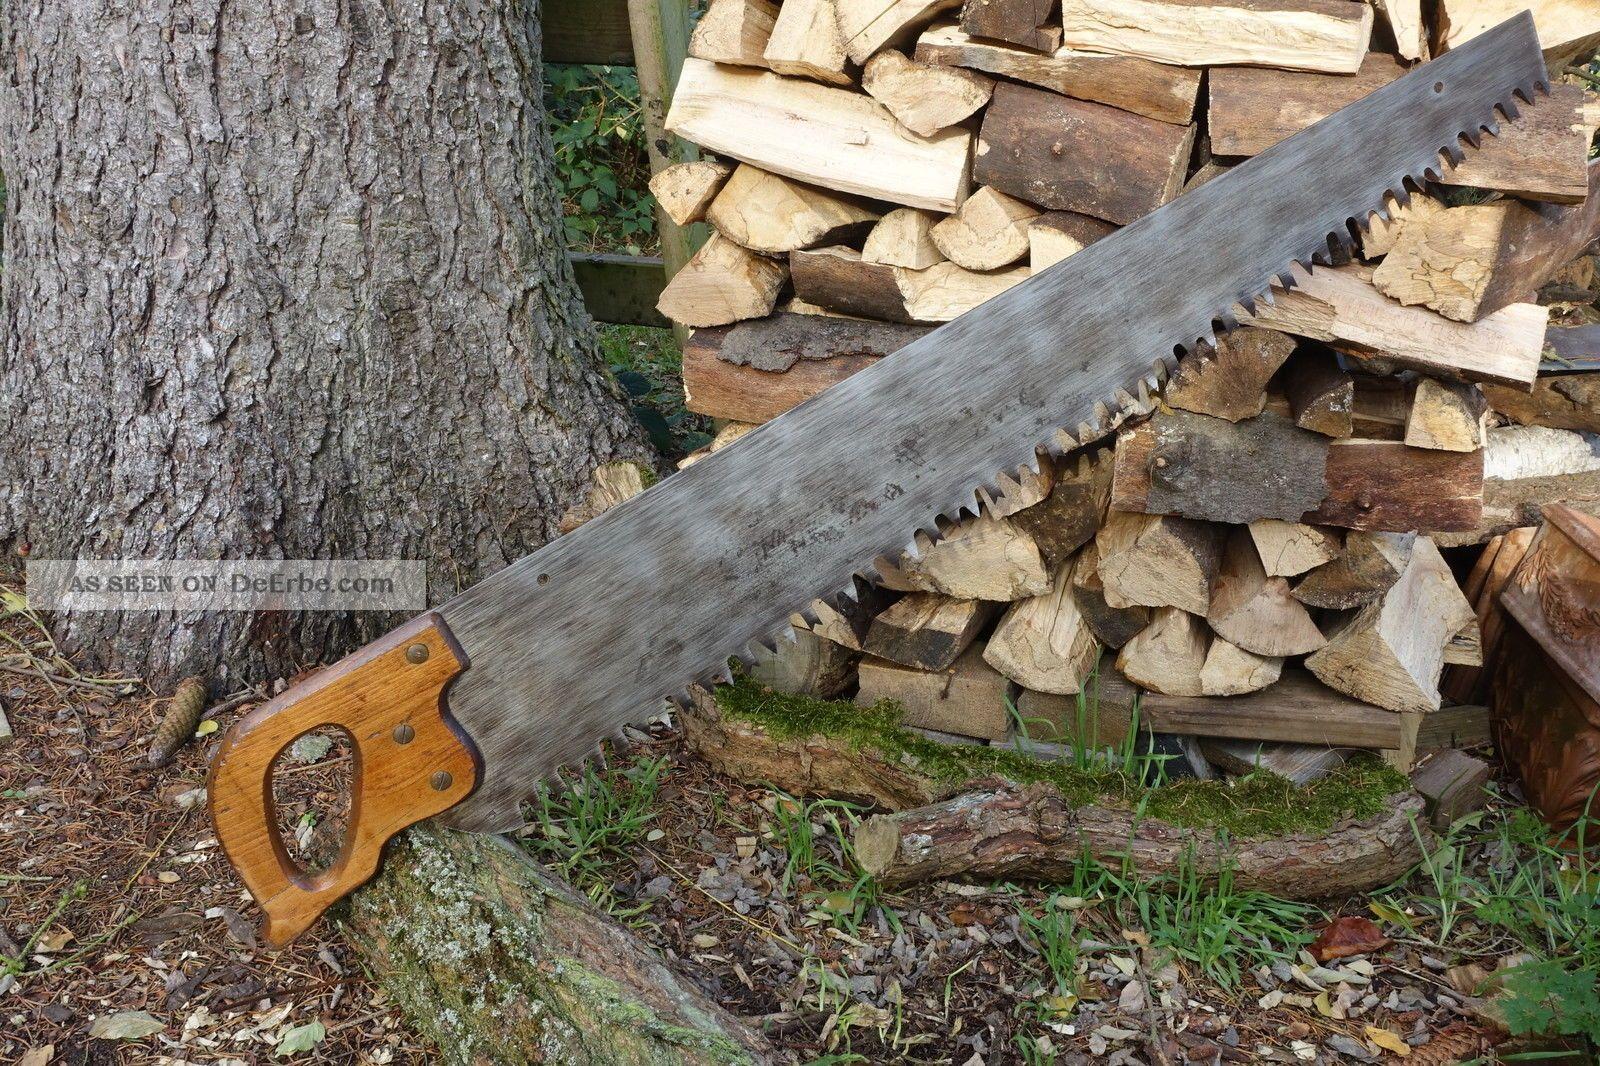 Kräftige Ein - Mann Schrotsäge,  Brennholzsäge,  Handgeschärft,  1 Man Cross Cut Saw Zimmermann Bild